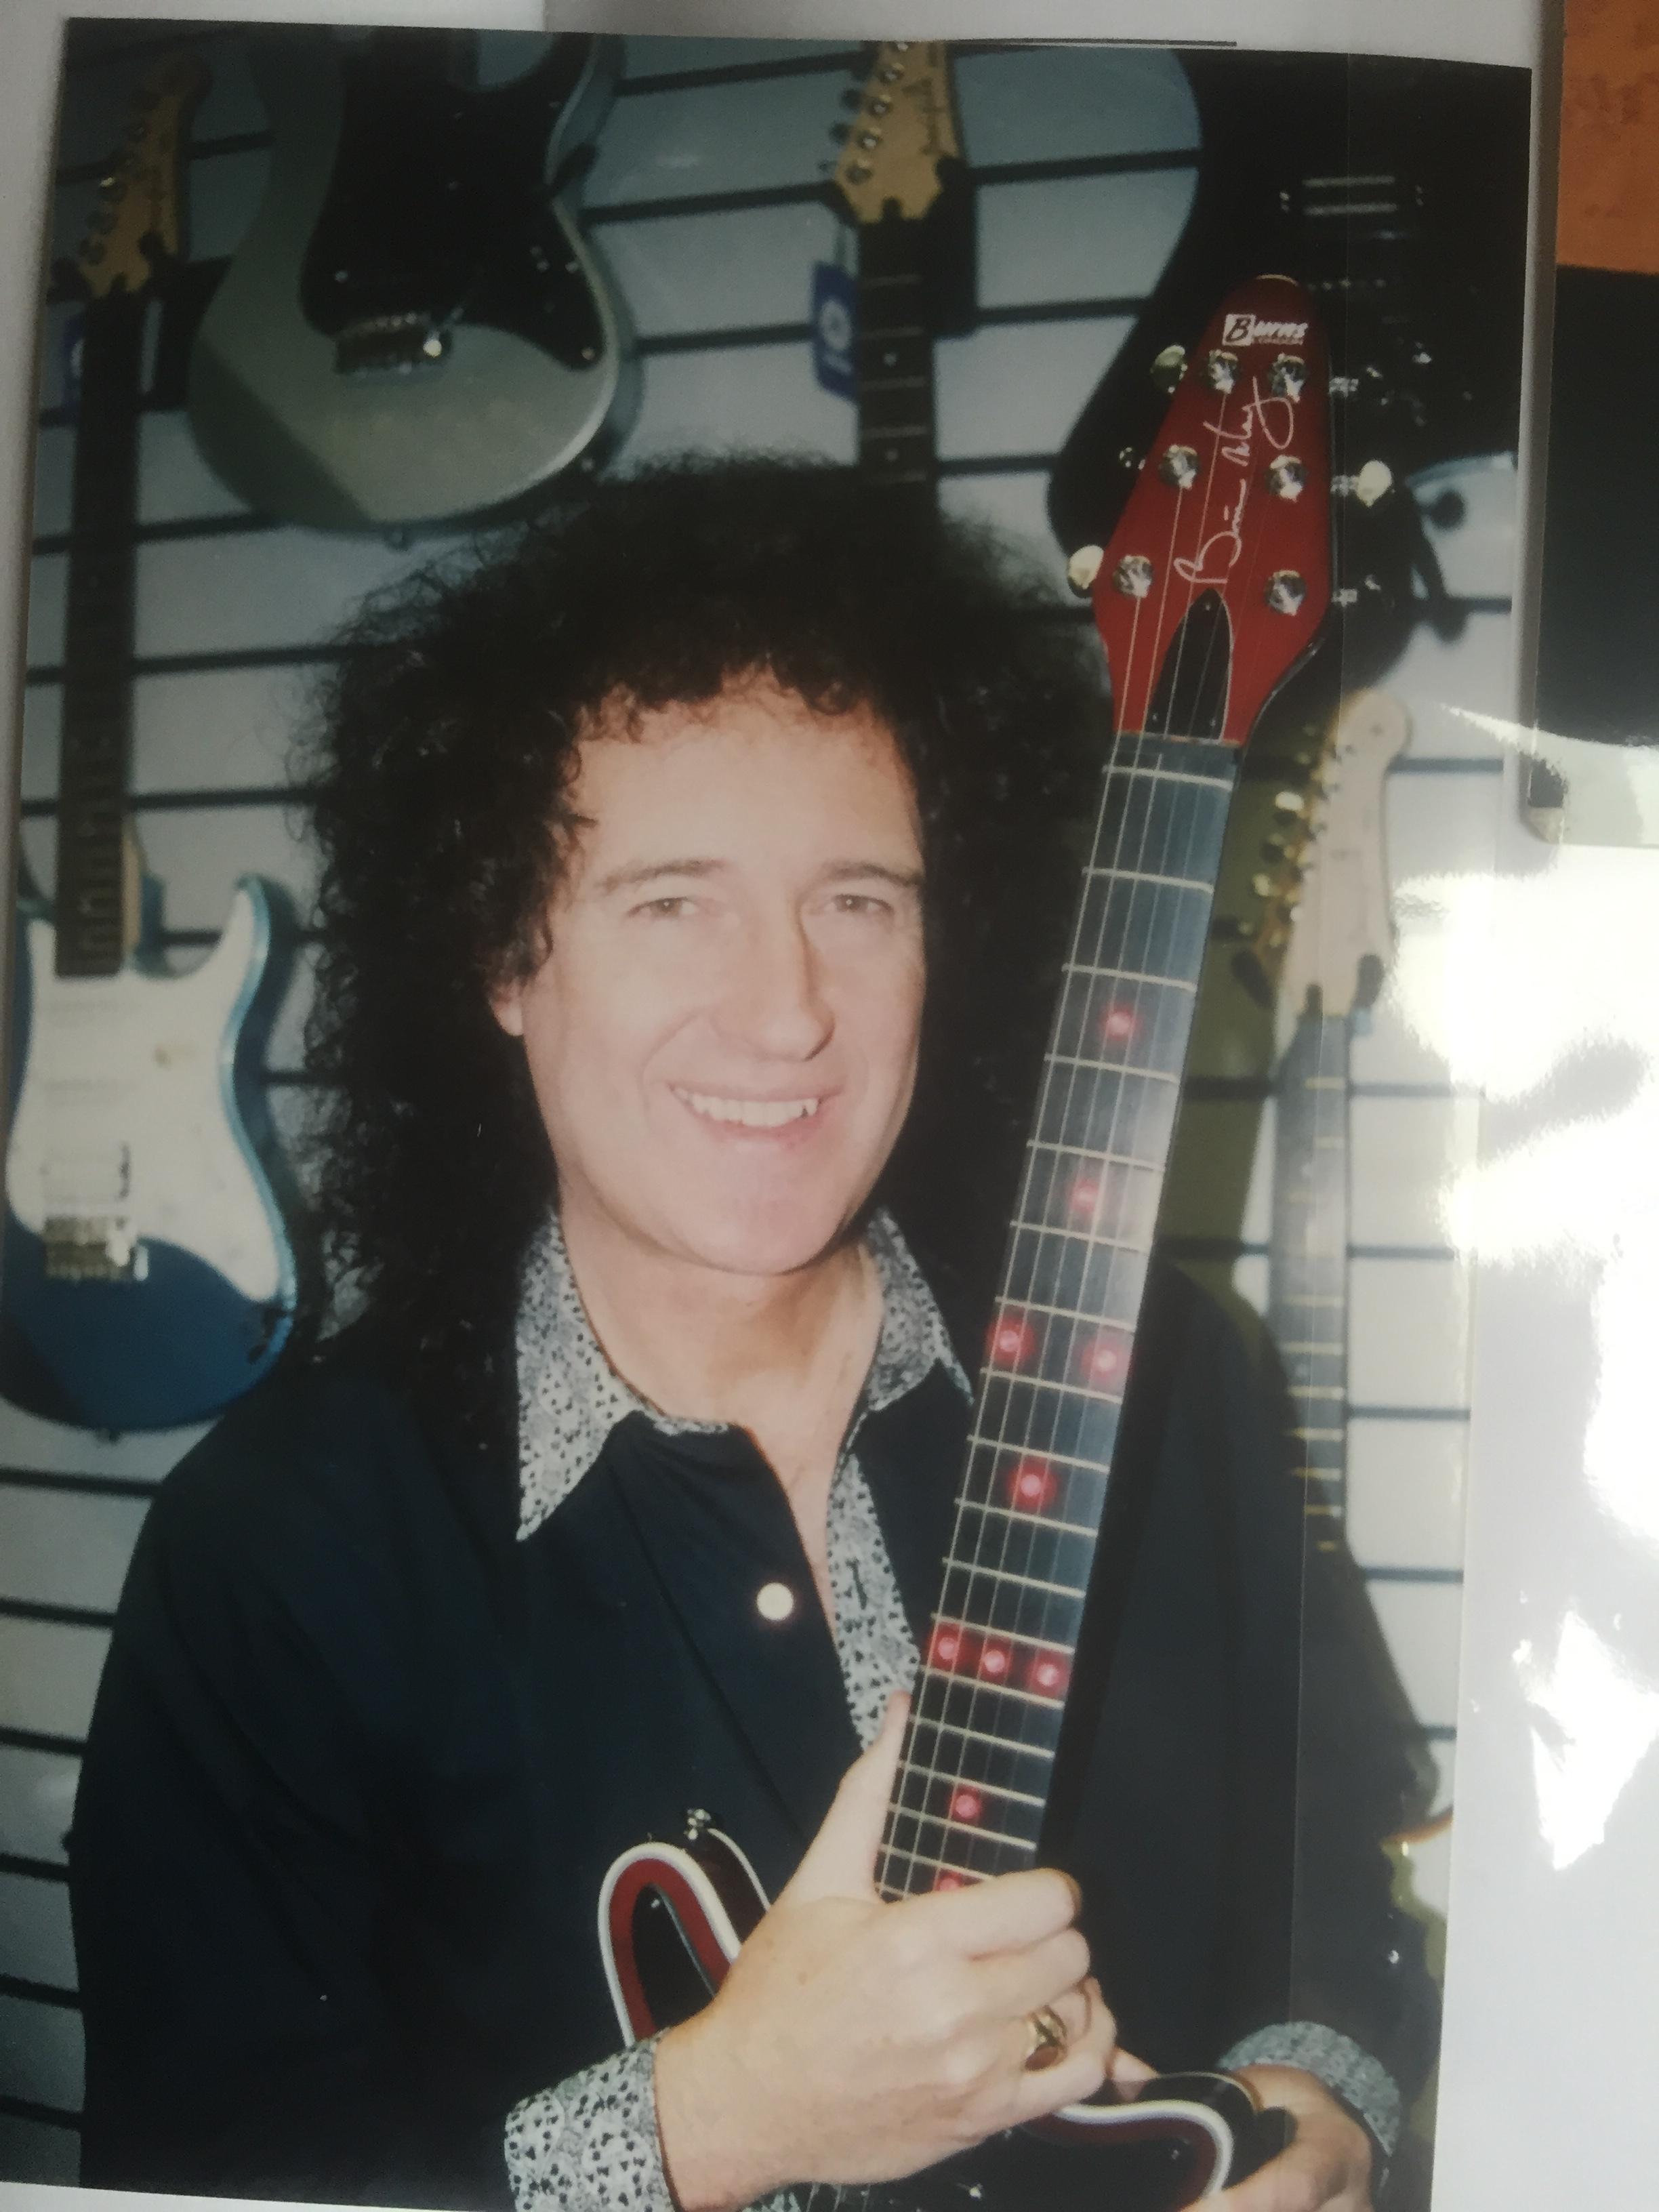 Brian May - Queen